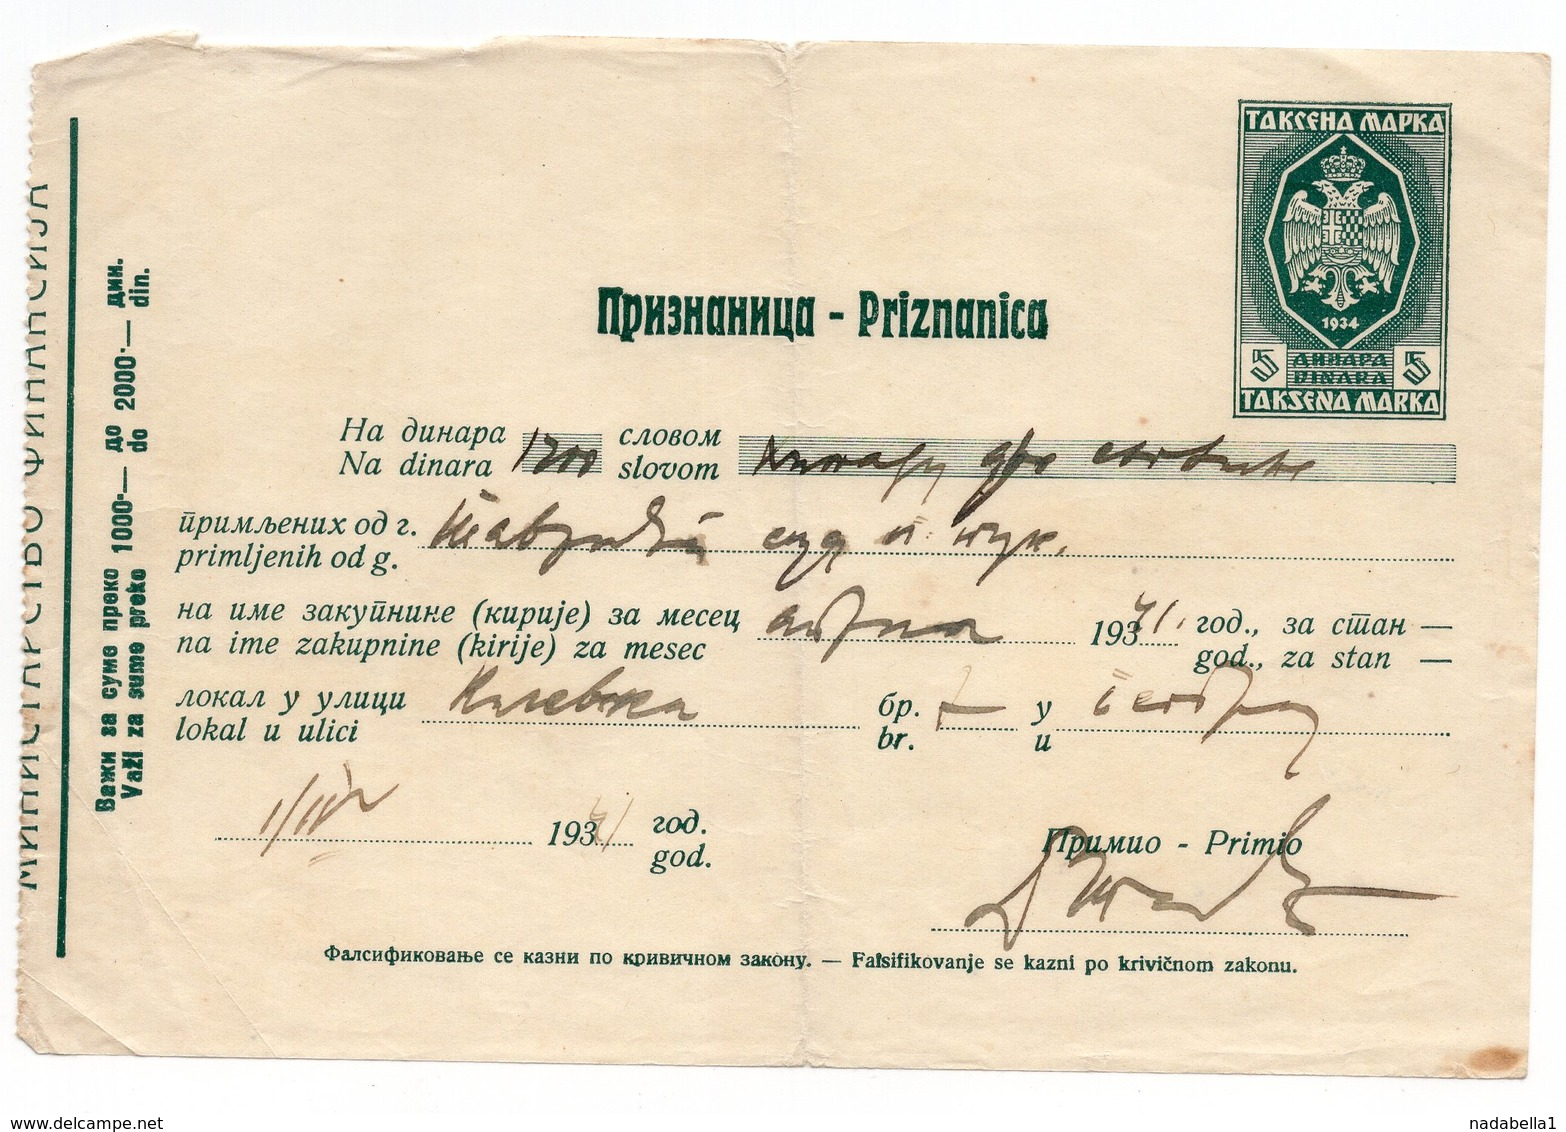 1941 YUGOSLAVIA, SERBIA, BELGRADE, MONEY RECEIPT FOR SHOP RENT, 01.04.1941, IMPRINTED FISKAL STAMP - Other